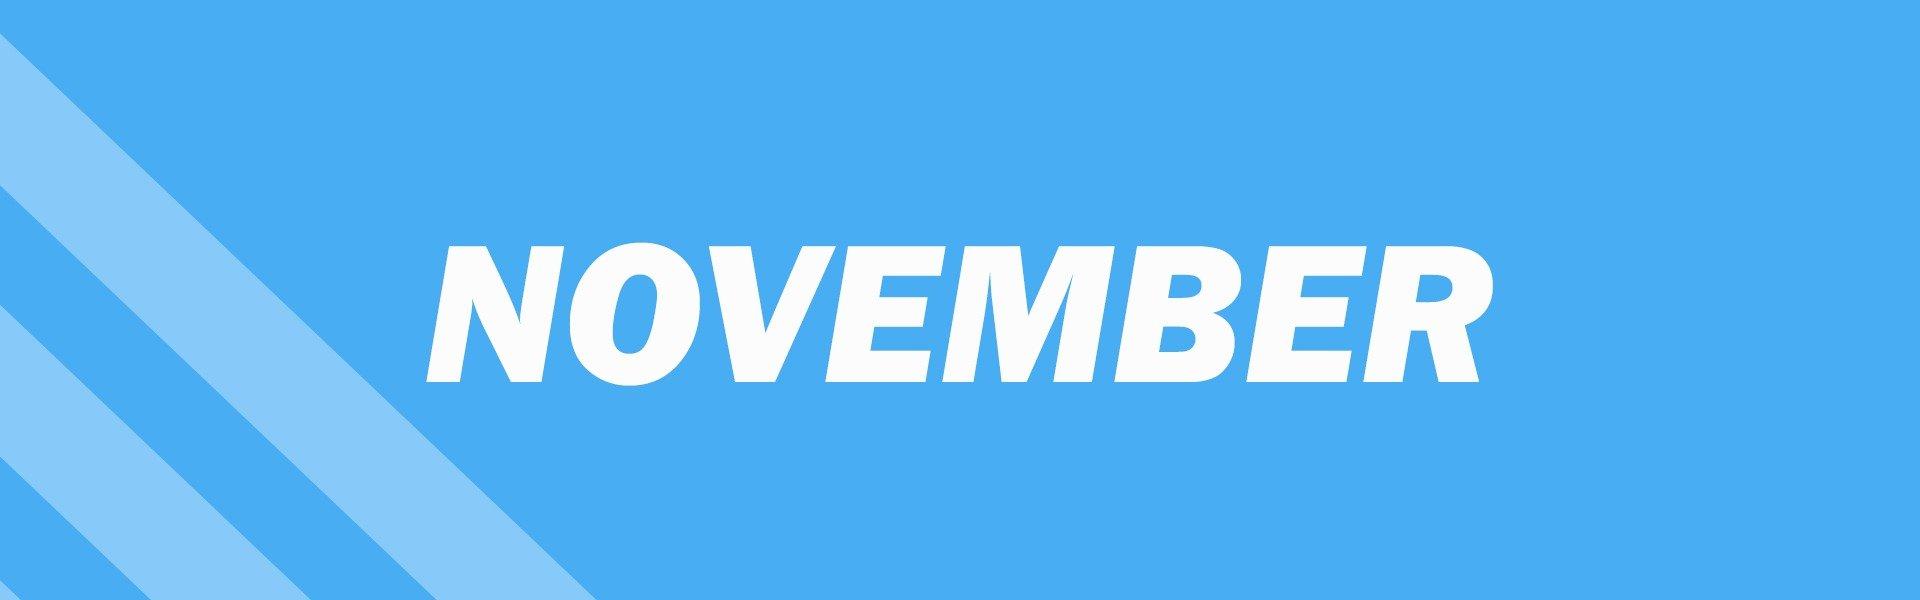 november_declaration-banner